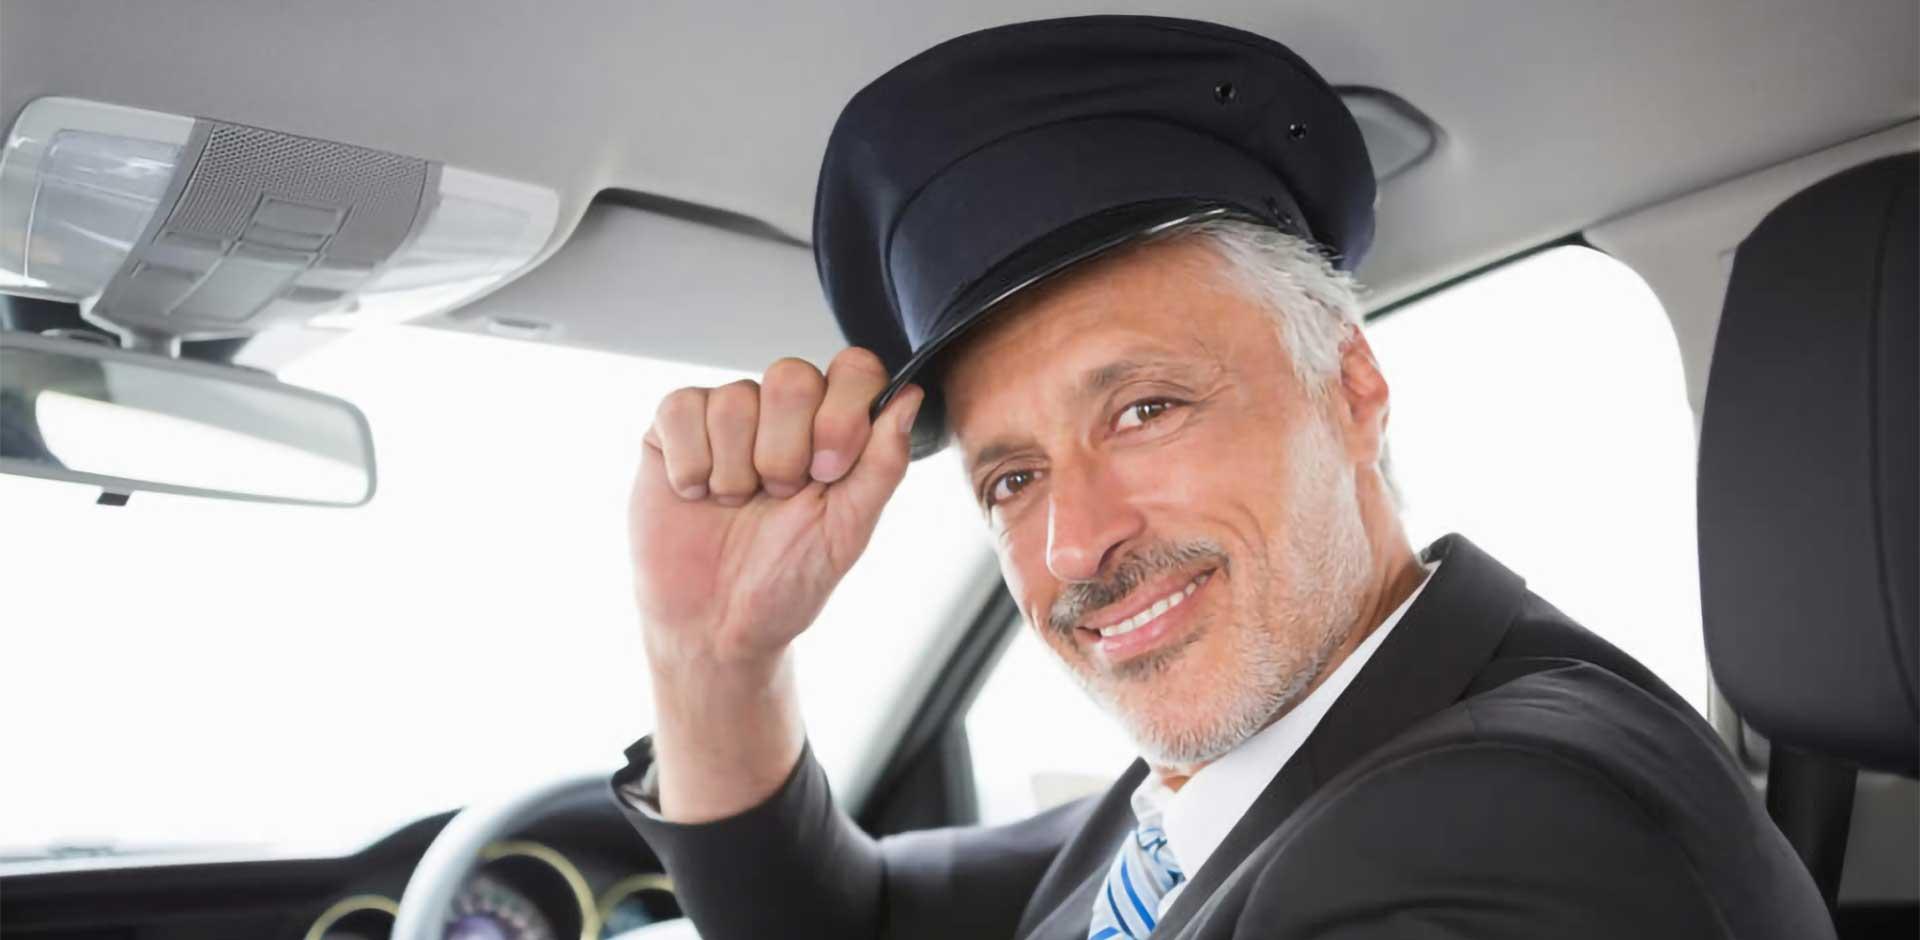 Buffalo Airport Shuttle Taxi